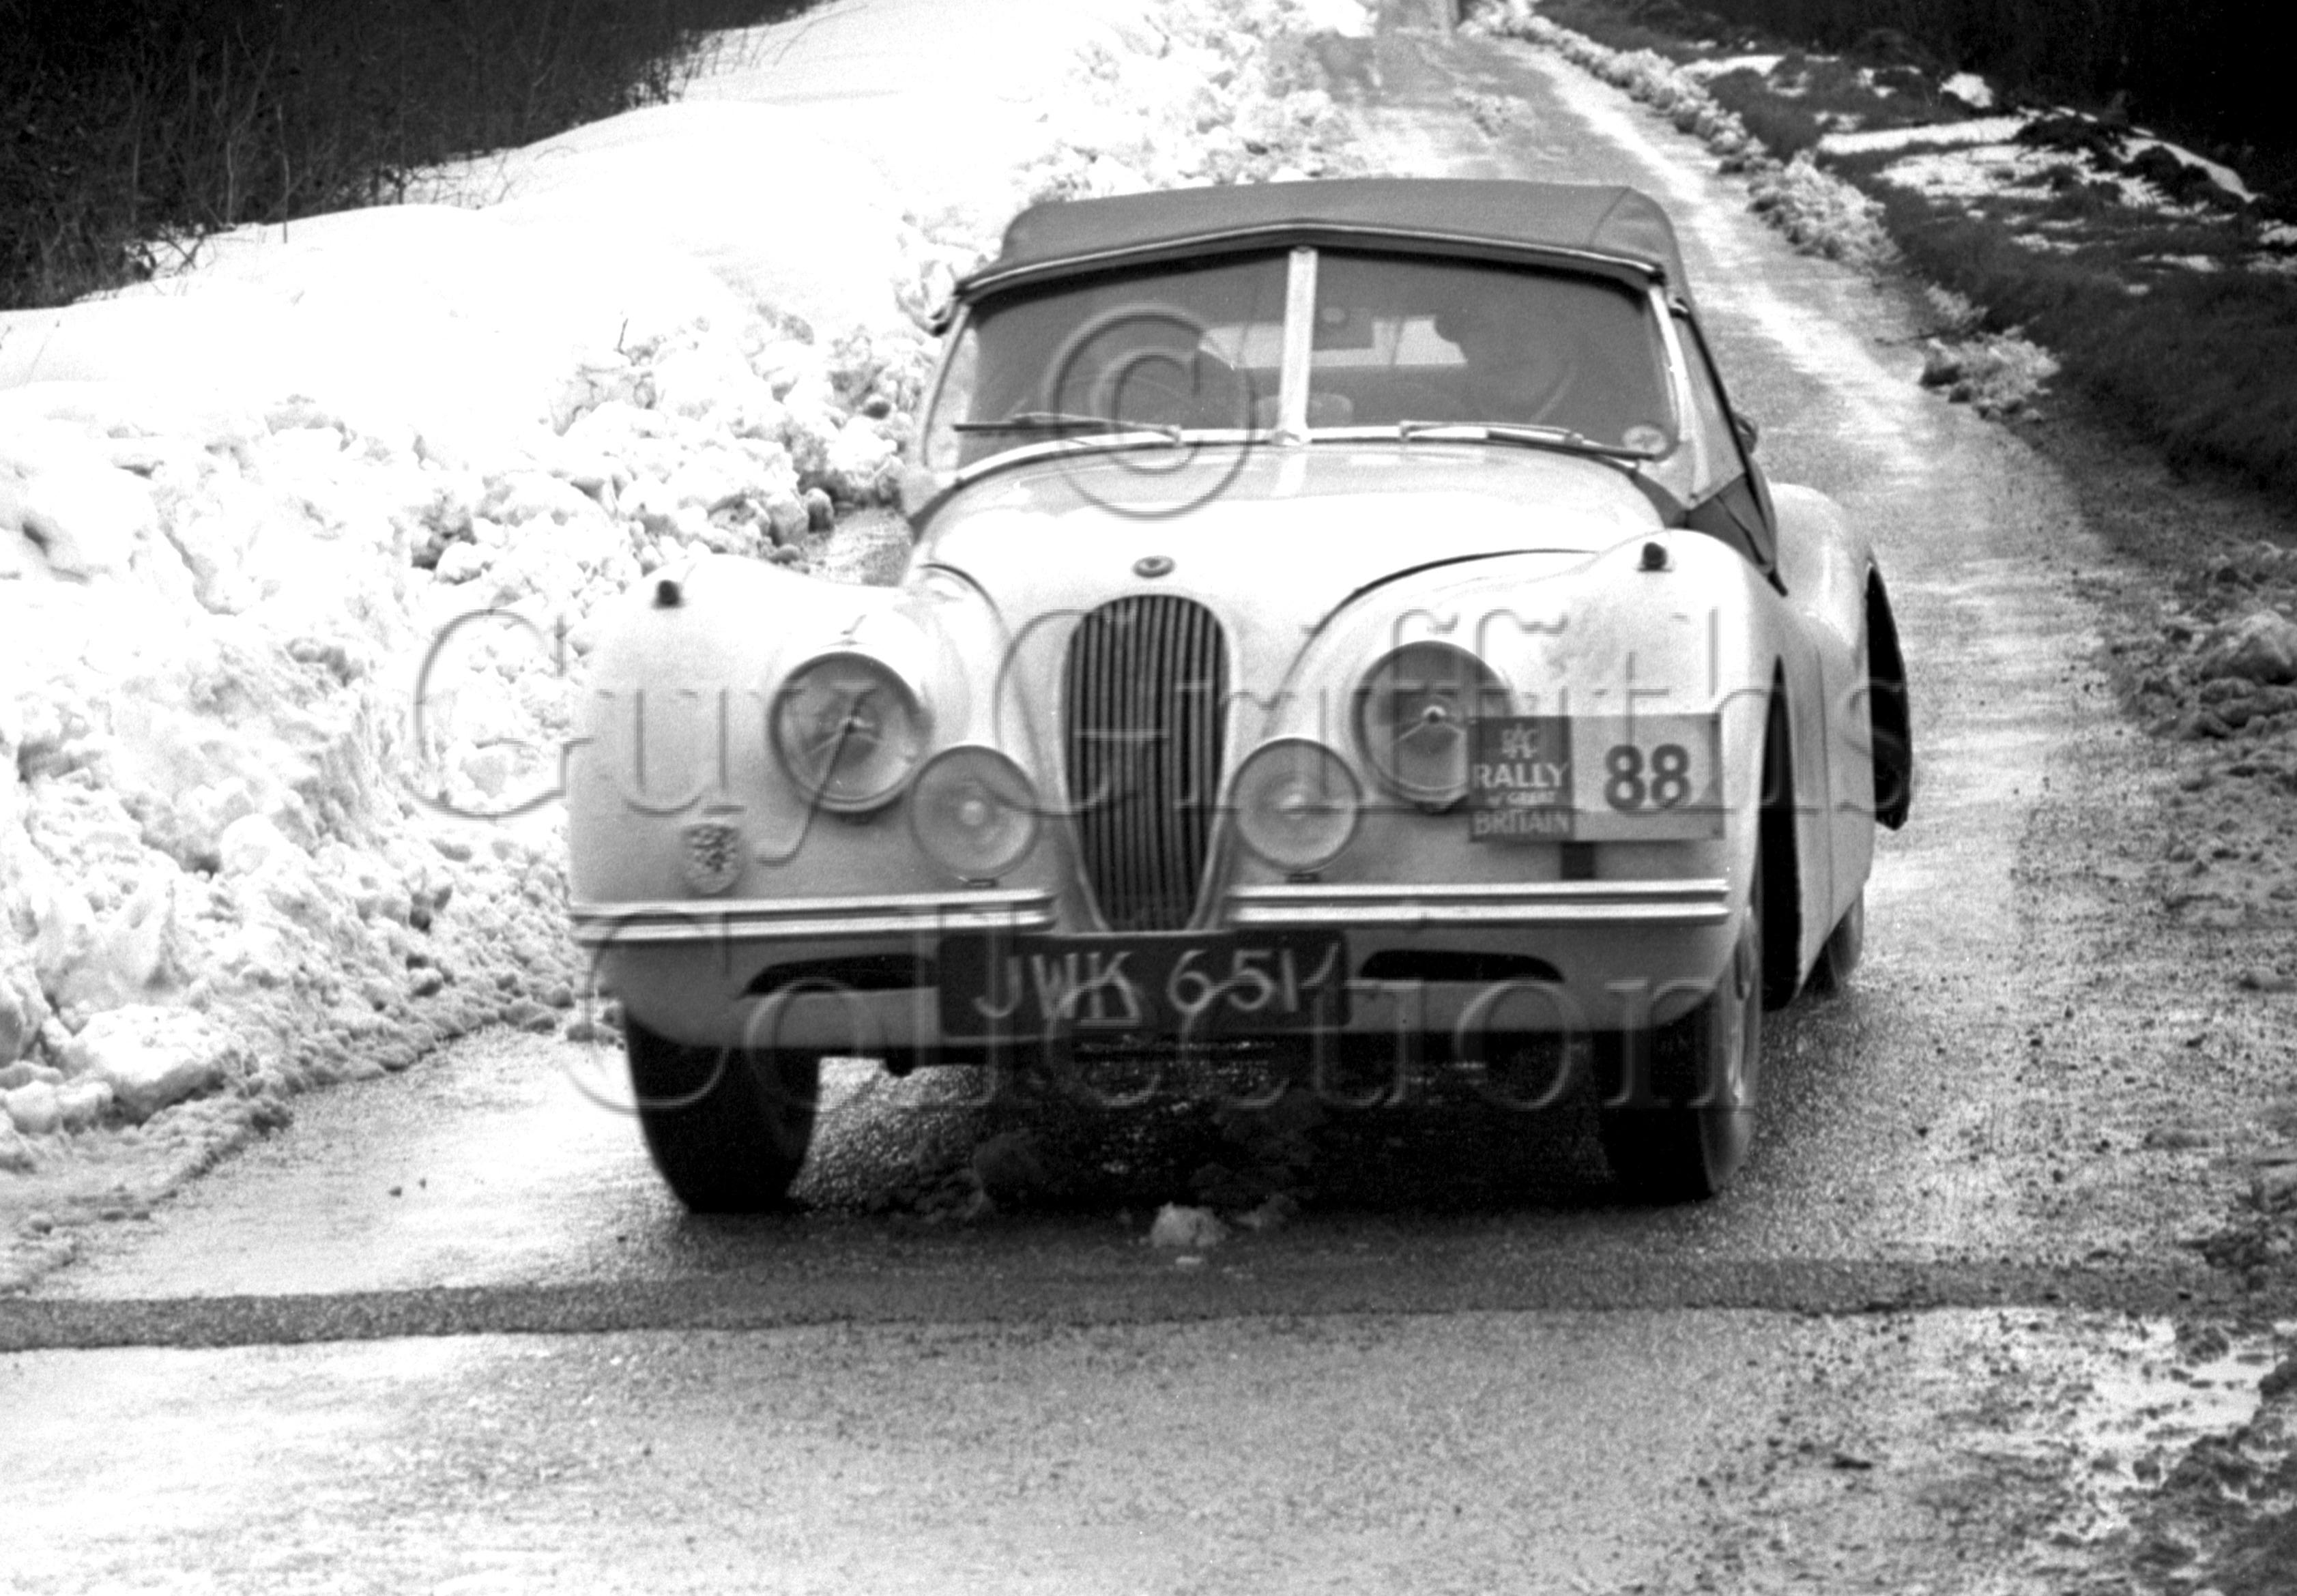 51-23–L-G-Johnson–Jaguar-XK-120–JWK-651–RAC-Rally–31-03-1952.jpg - Guy Griffiths Collection